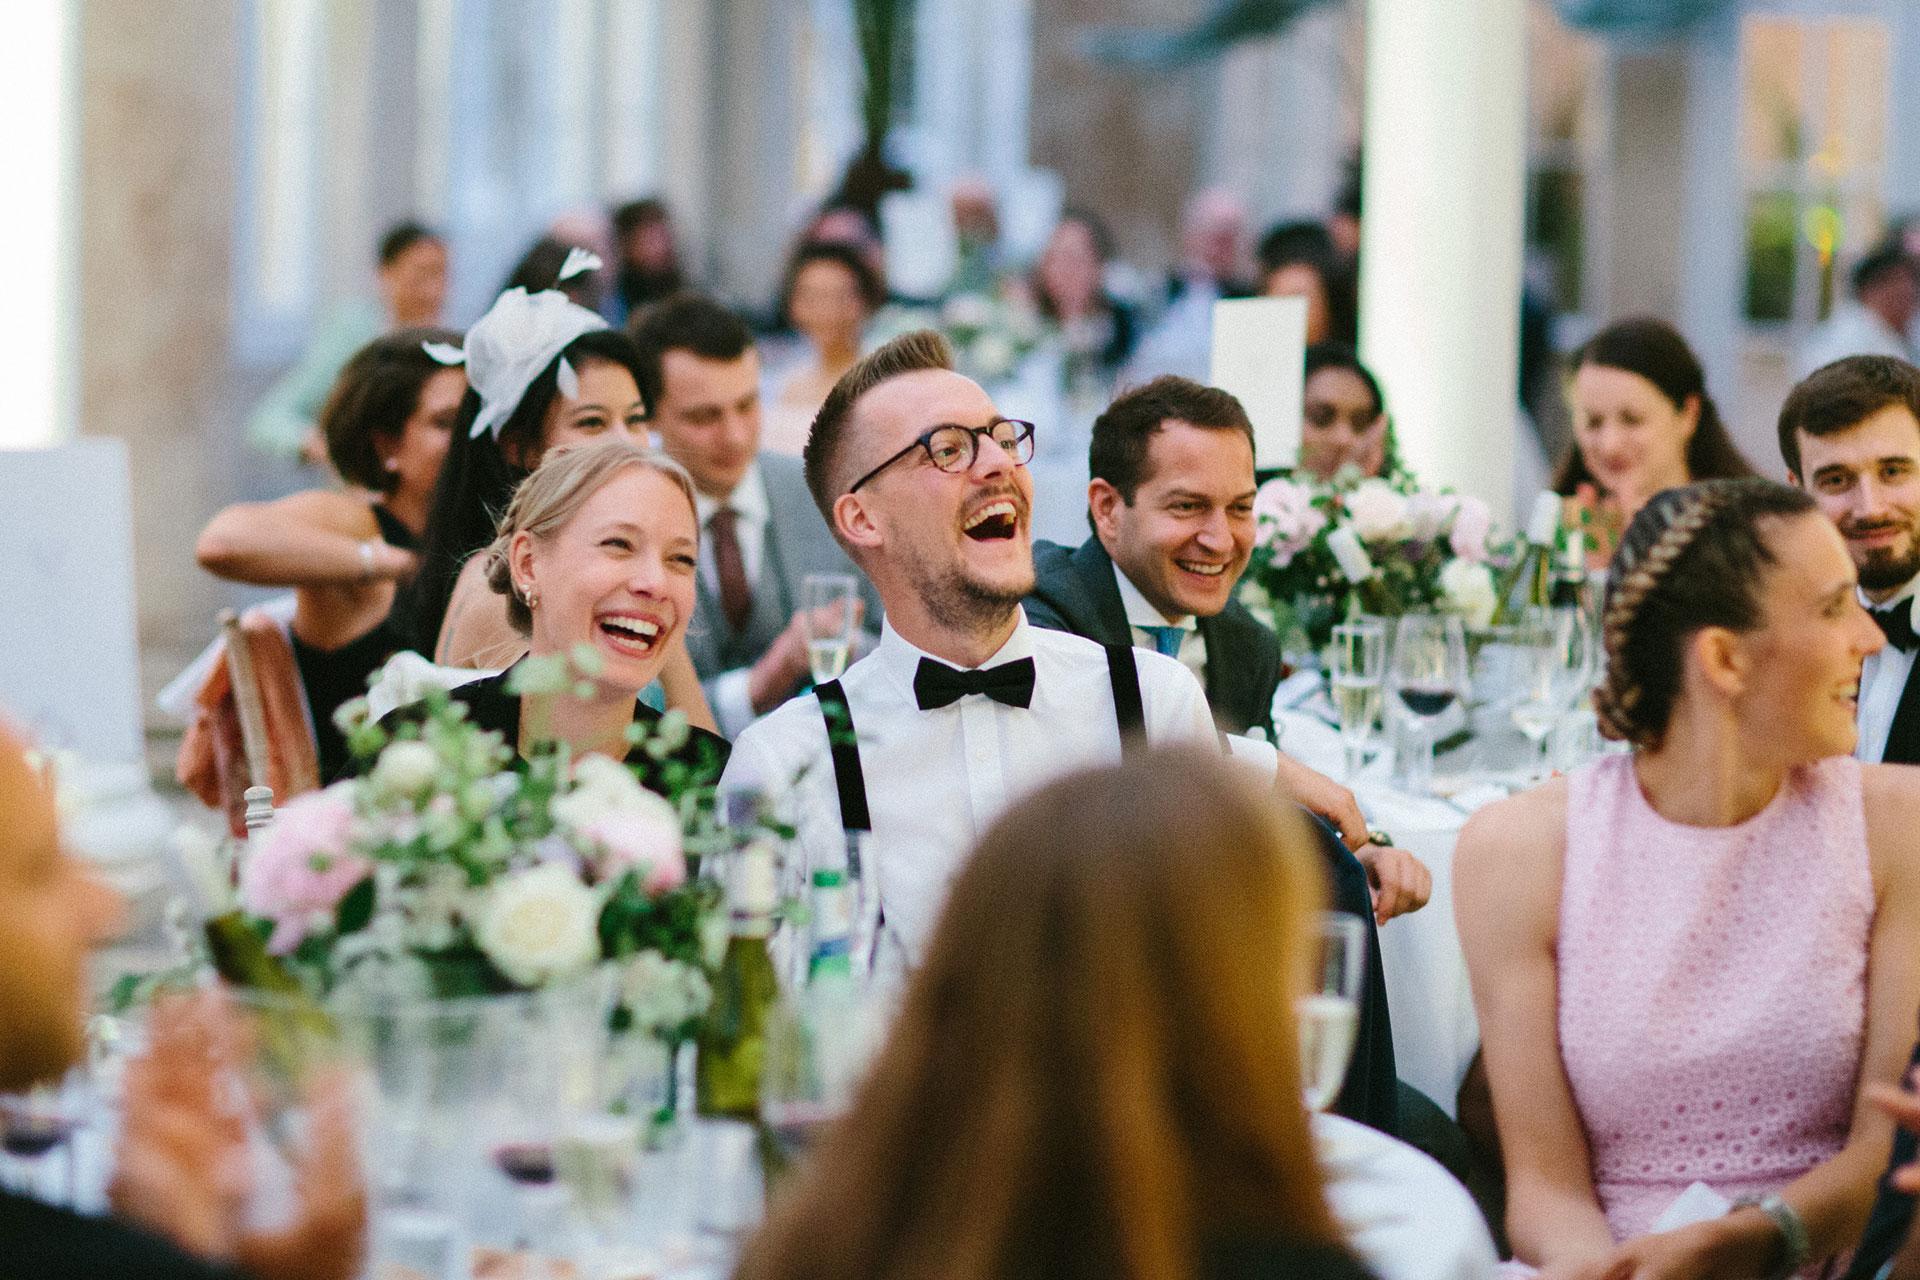 Syon-Park-Wedding-Photographer--_-Michael-Newington-Gray-772.jpg